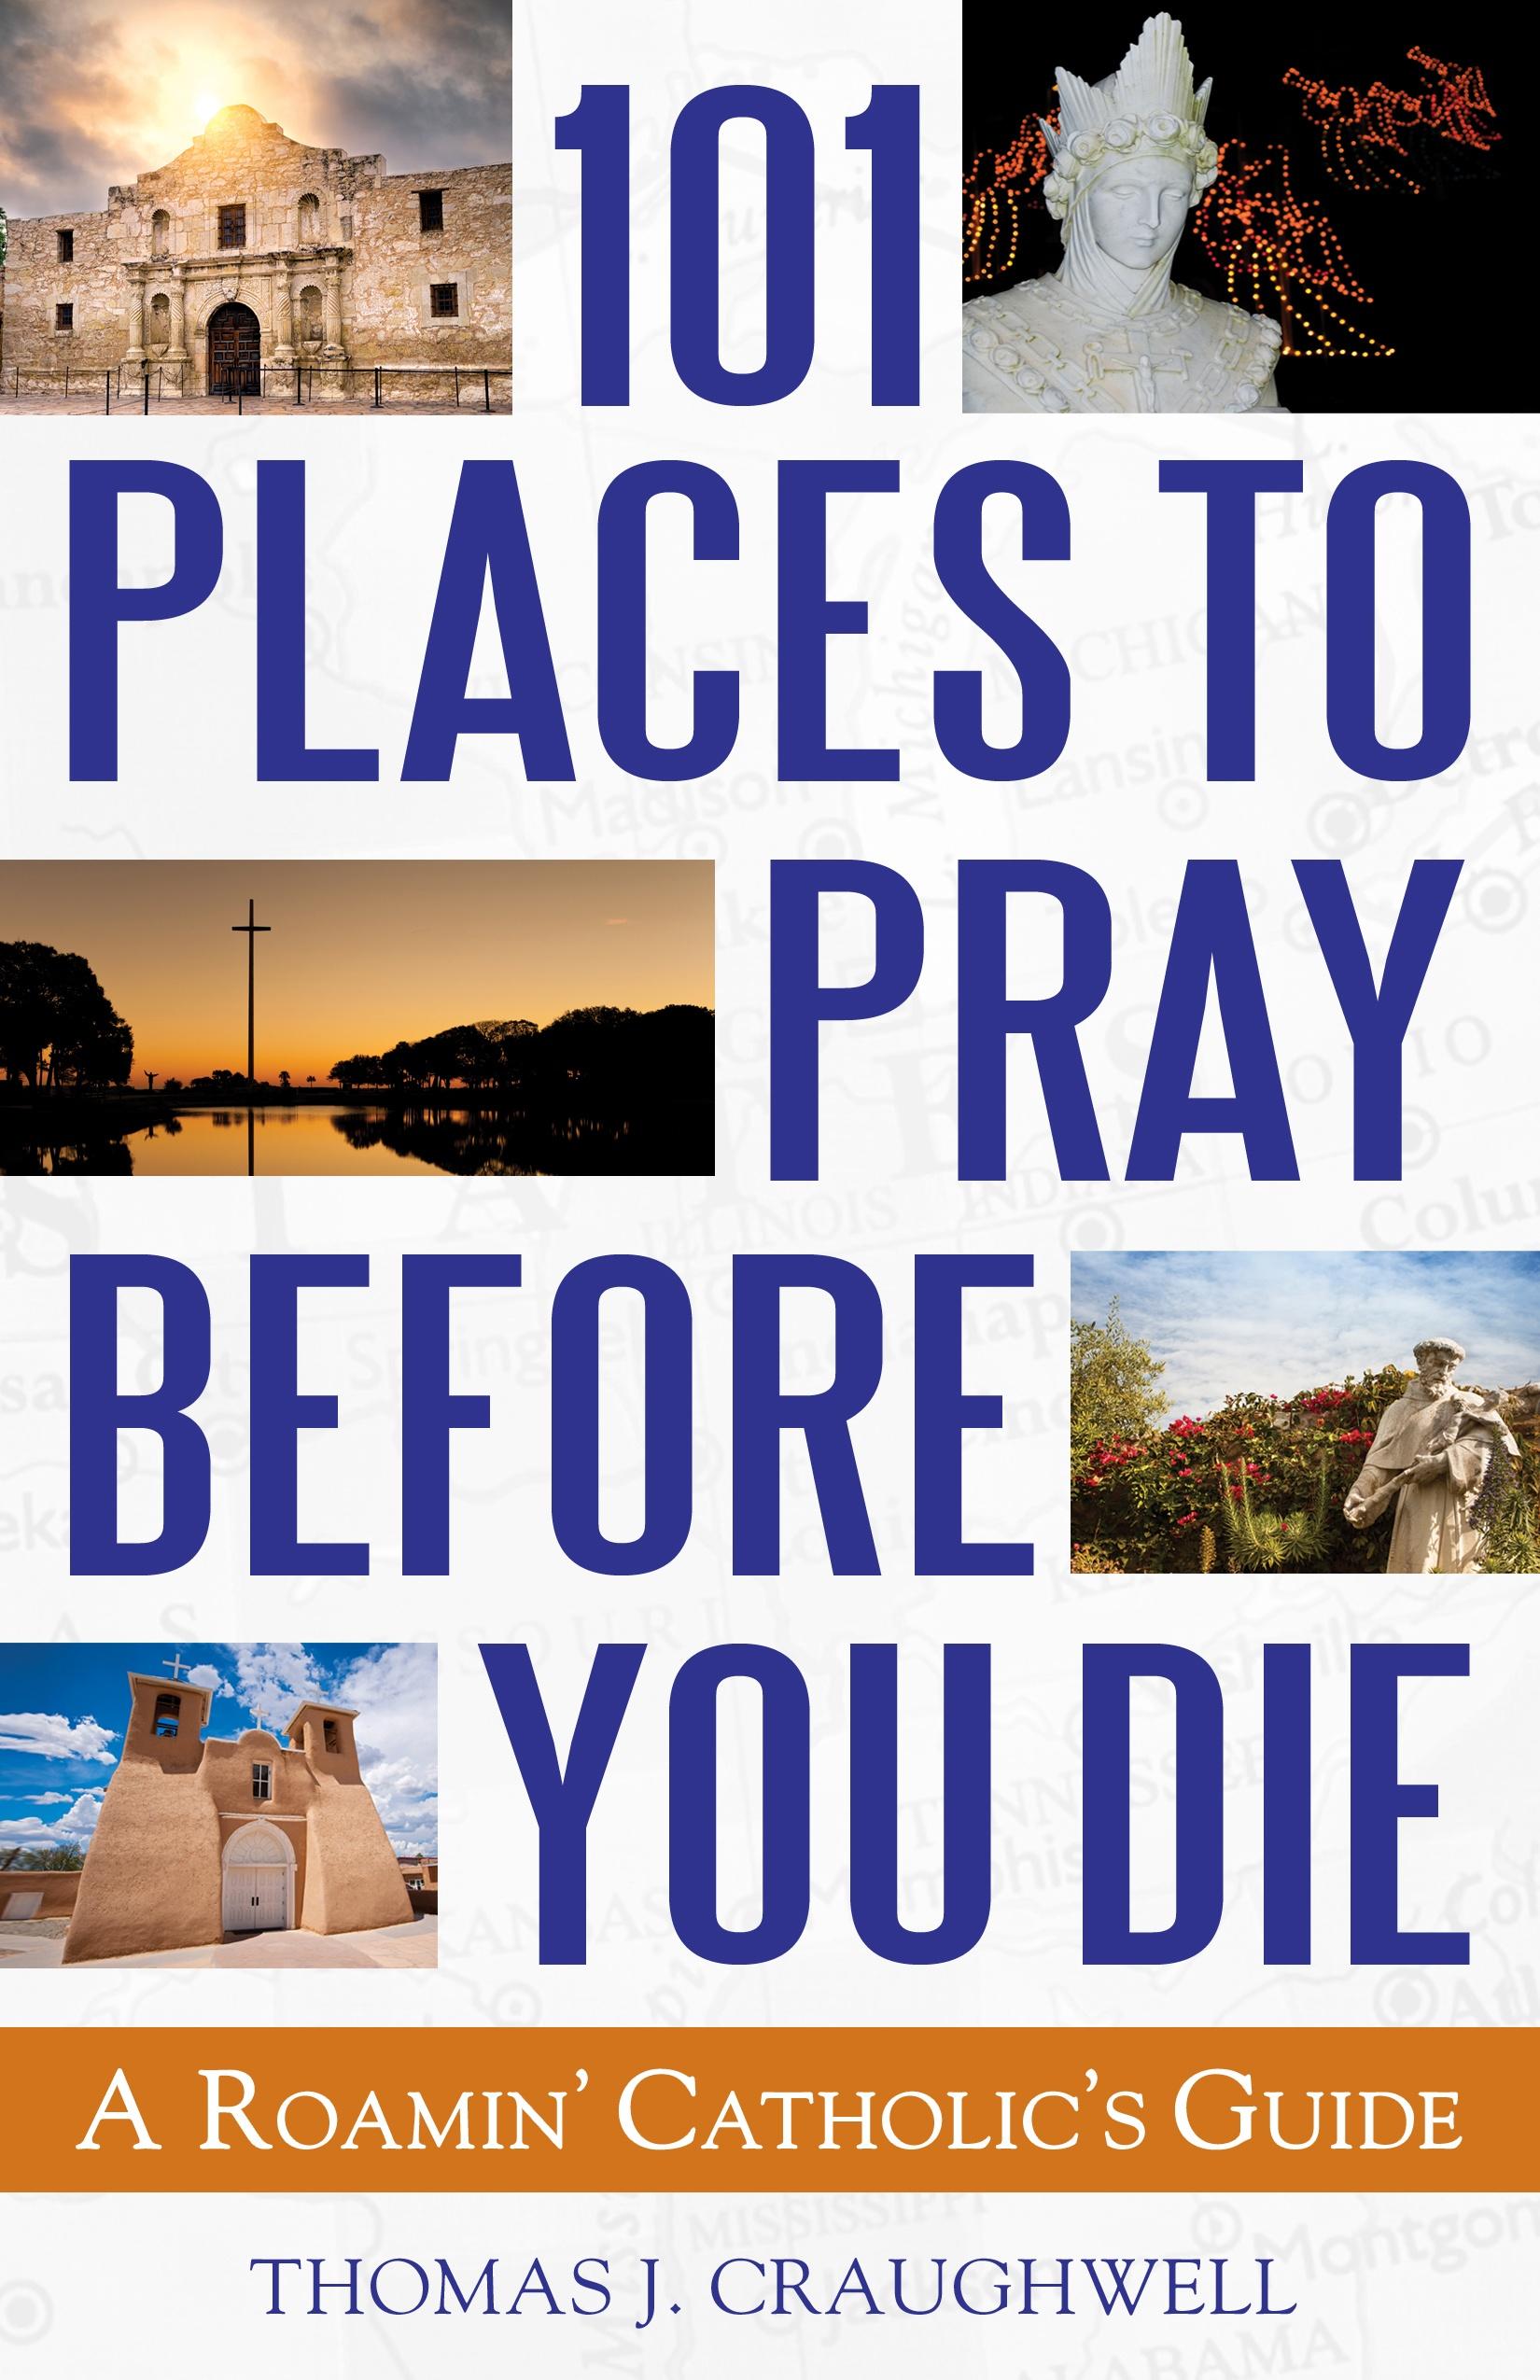 101_Places_to_Pray_Before_You_Die.jpg